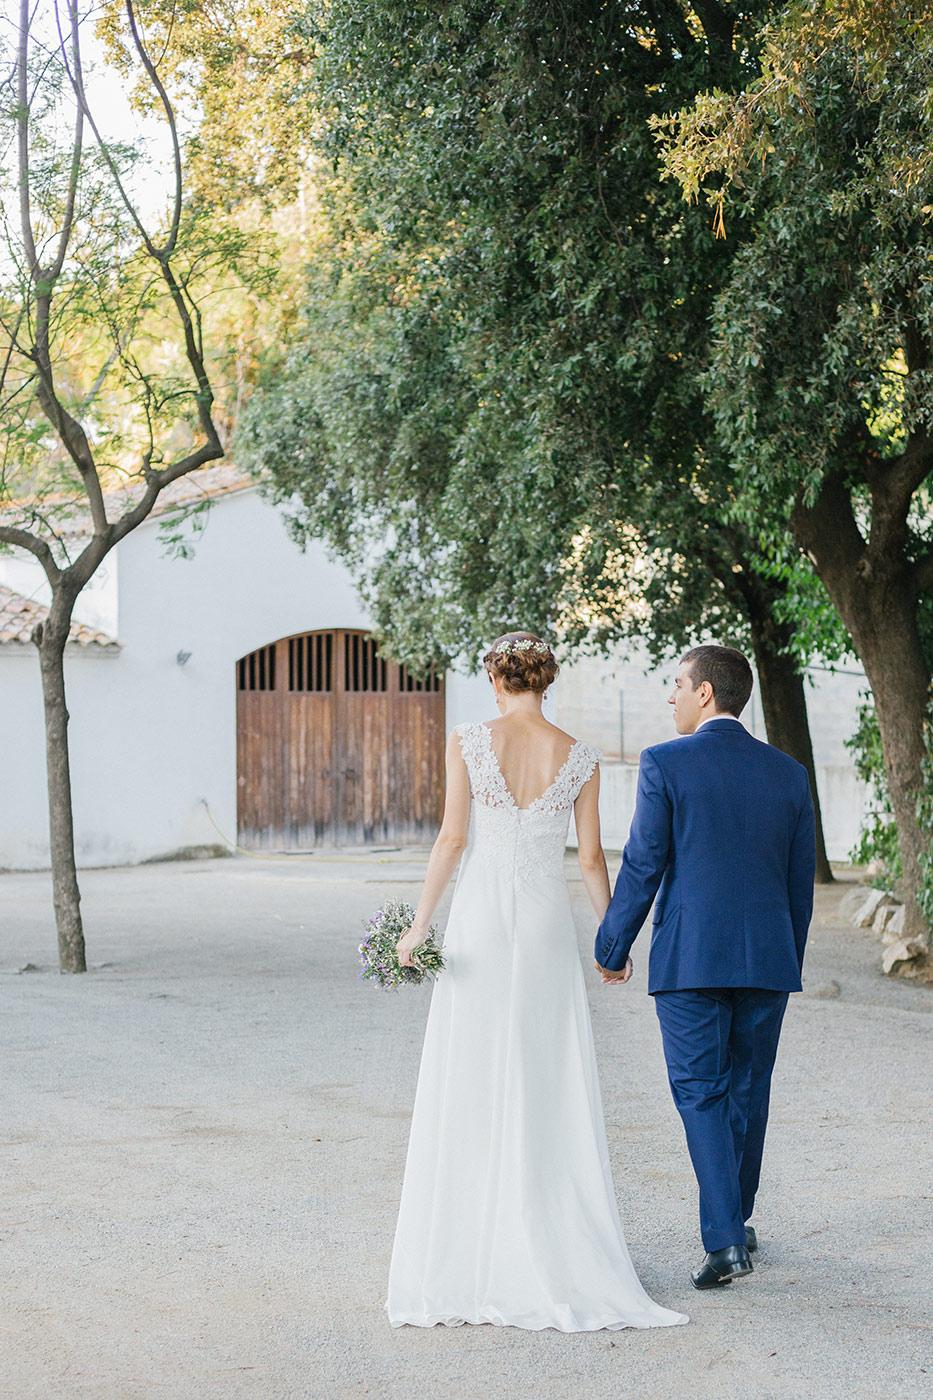 Mas Pujol Wedding Photographer Barcelona | Lena Karelova Photography | Destination Wedding Photographer Barcelona |Film Wedding Photographer